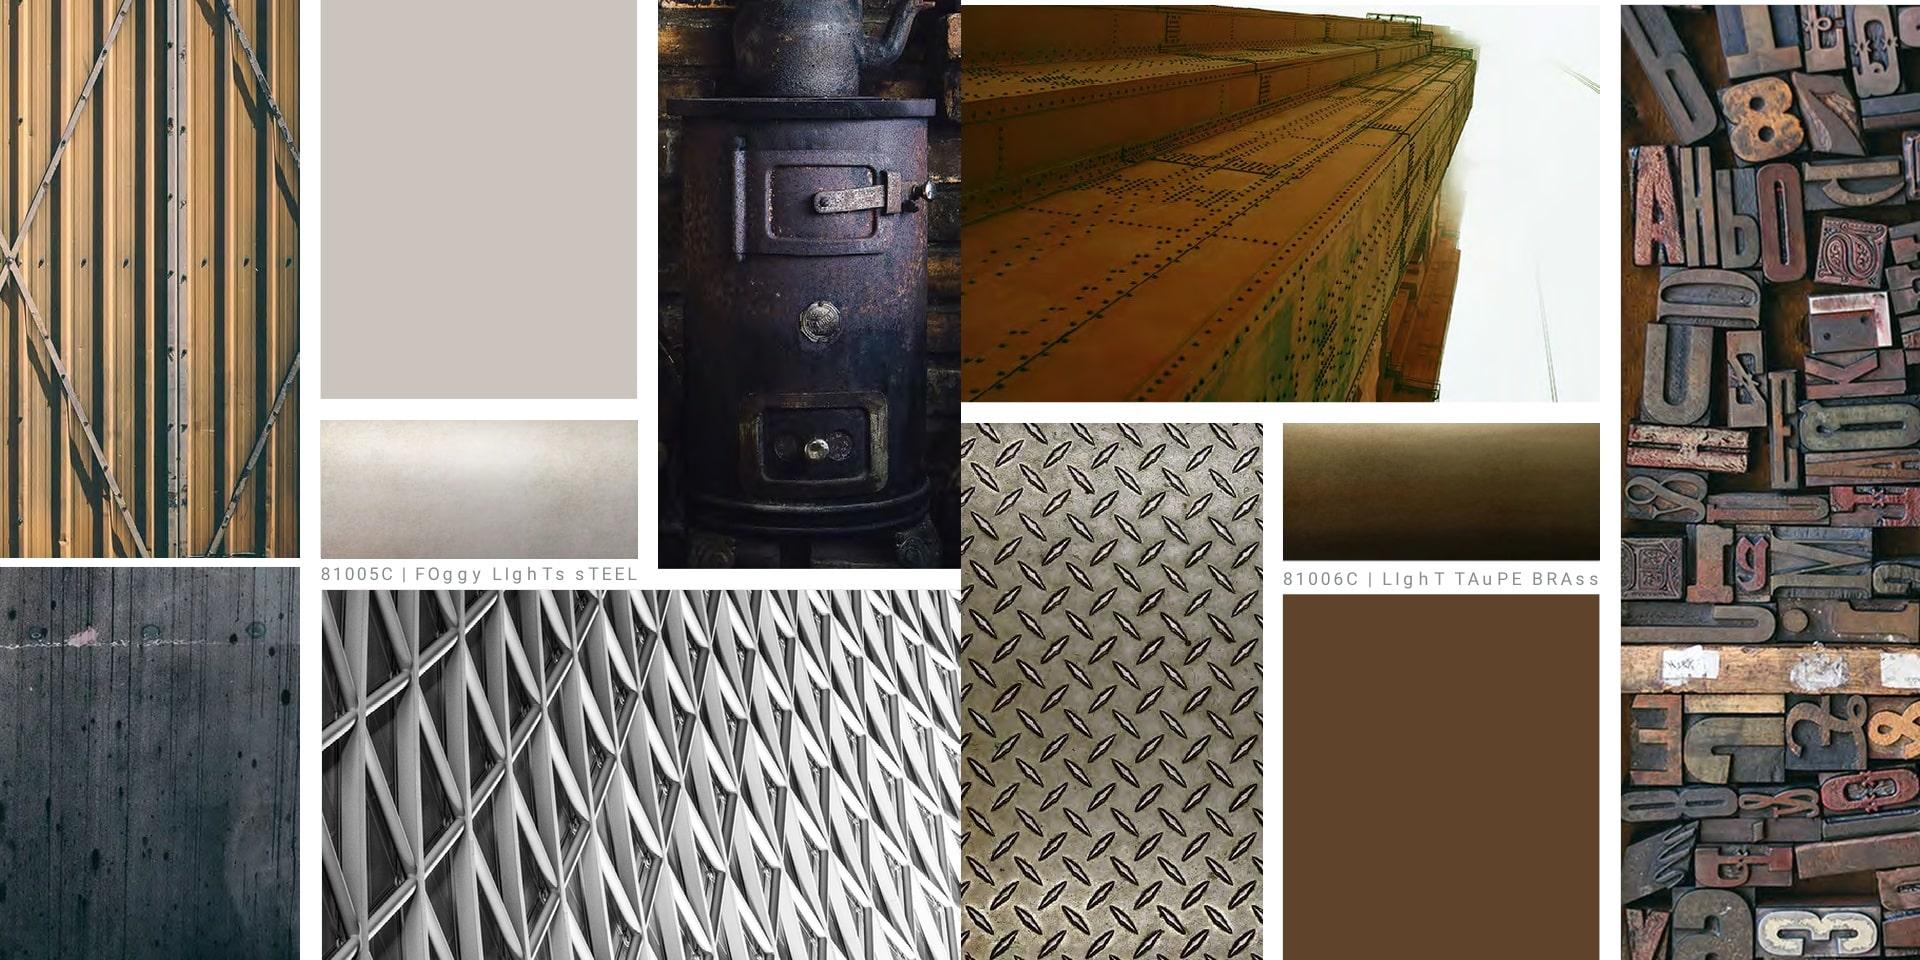 Catalogo variazioni metalliche